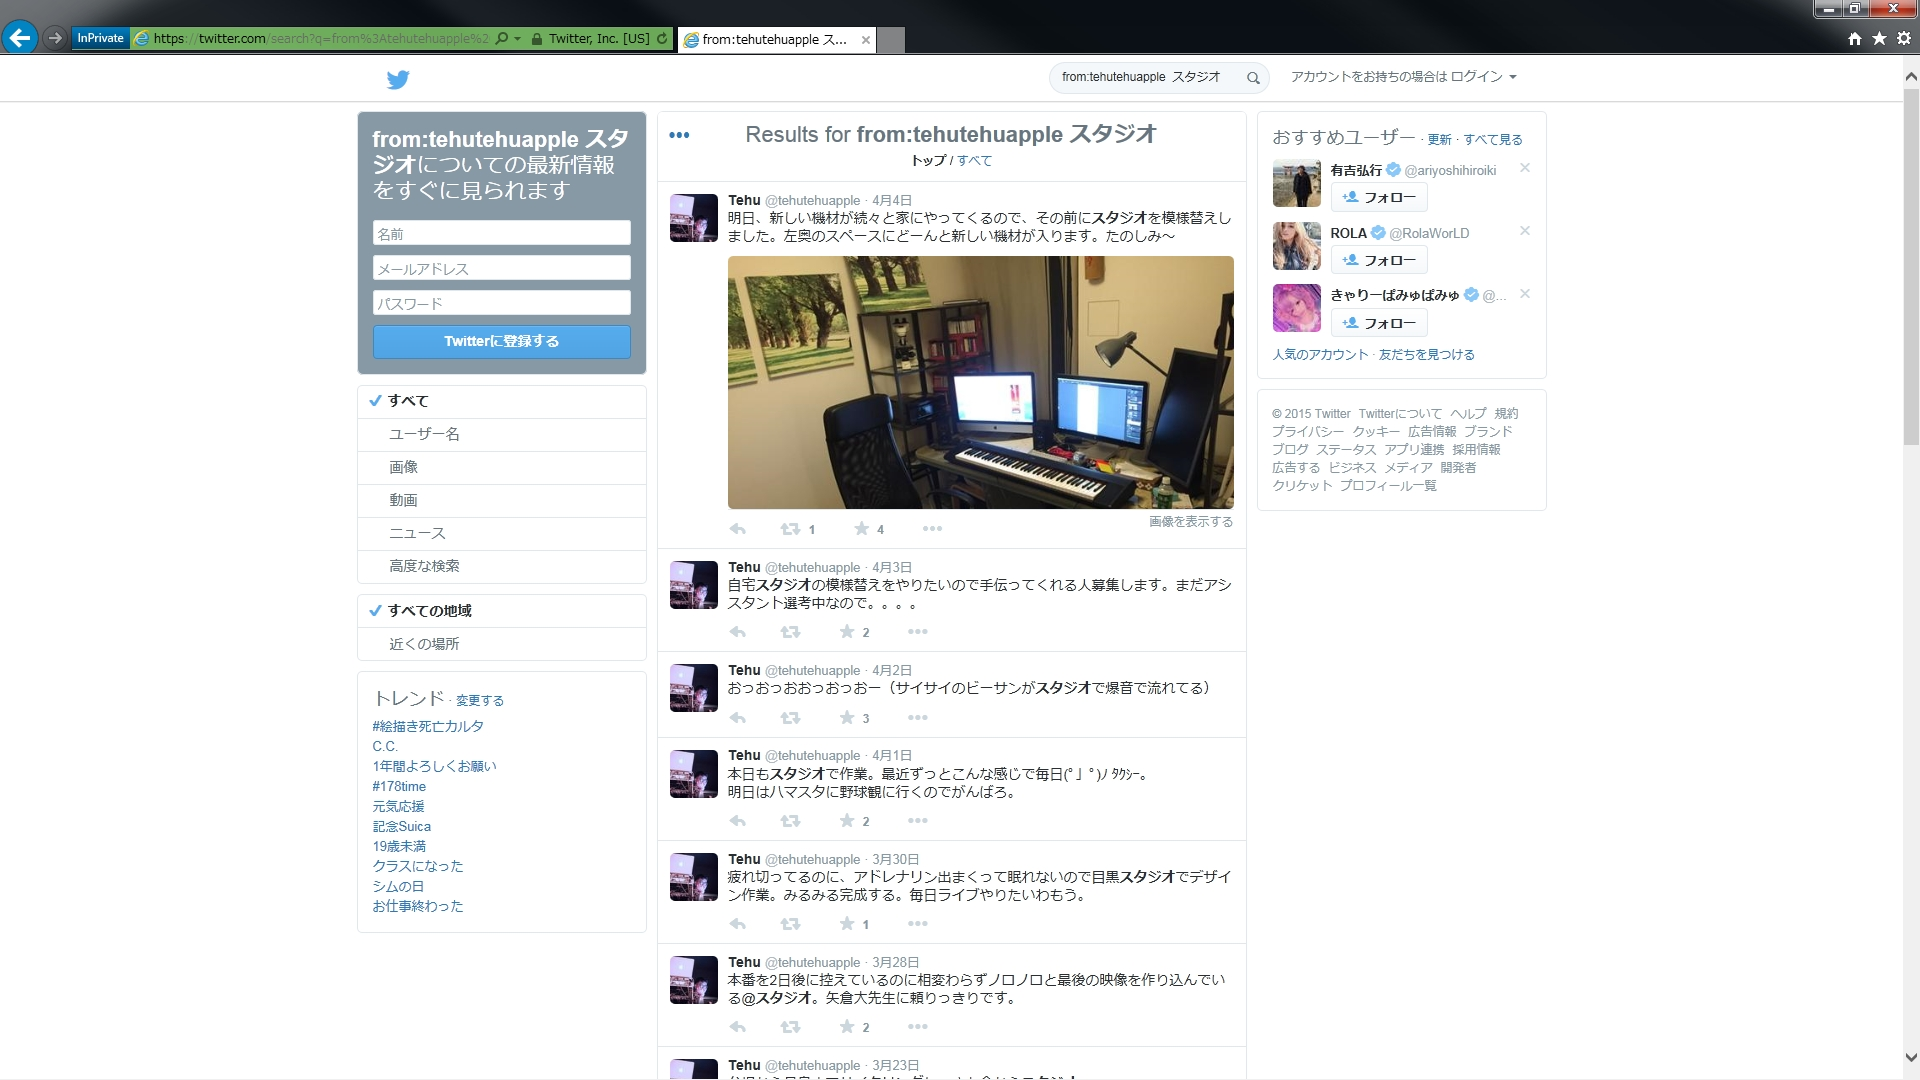 http://f.st-hatena.com/images/fotolife/a/aicezuki2014/20150406/20150406172308.jpg